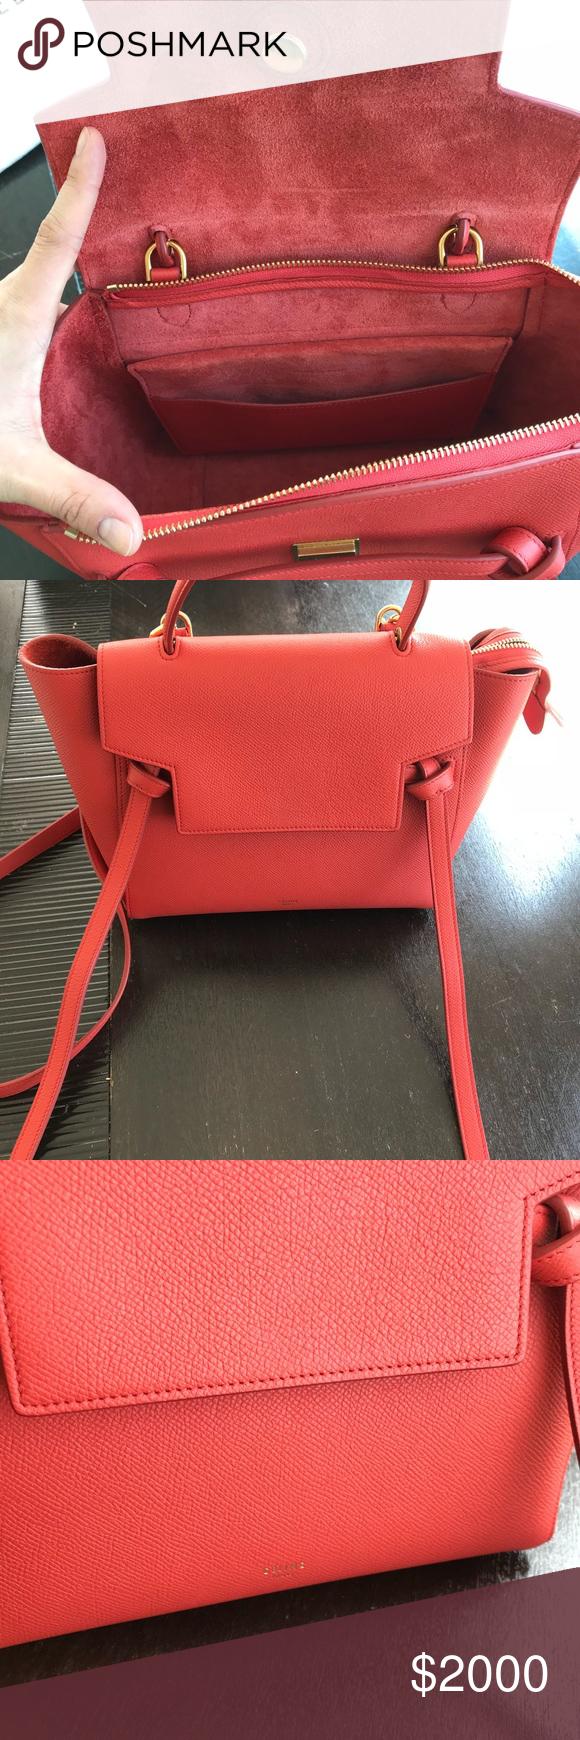 Celine Micro Belt Bag 100% authentic Celine Micro Belt Bag in grained  leather Color is 5b89608ea34ba